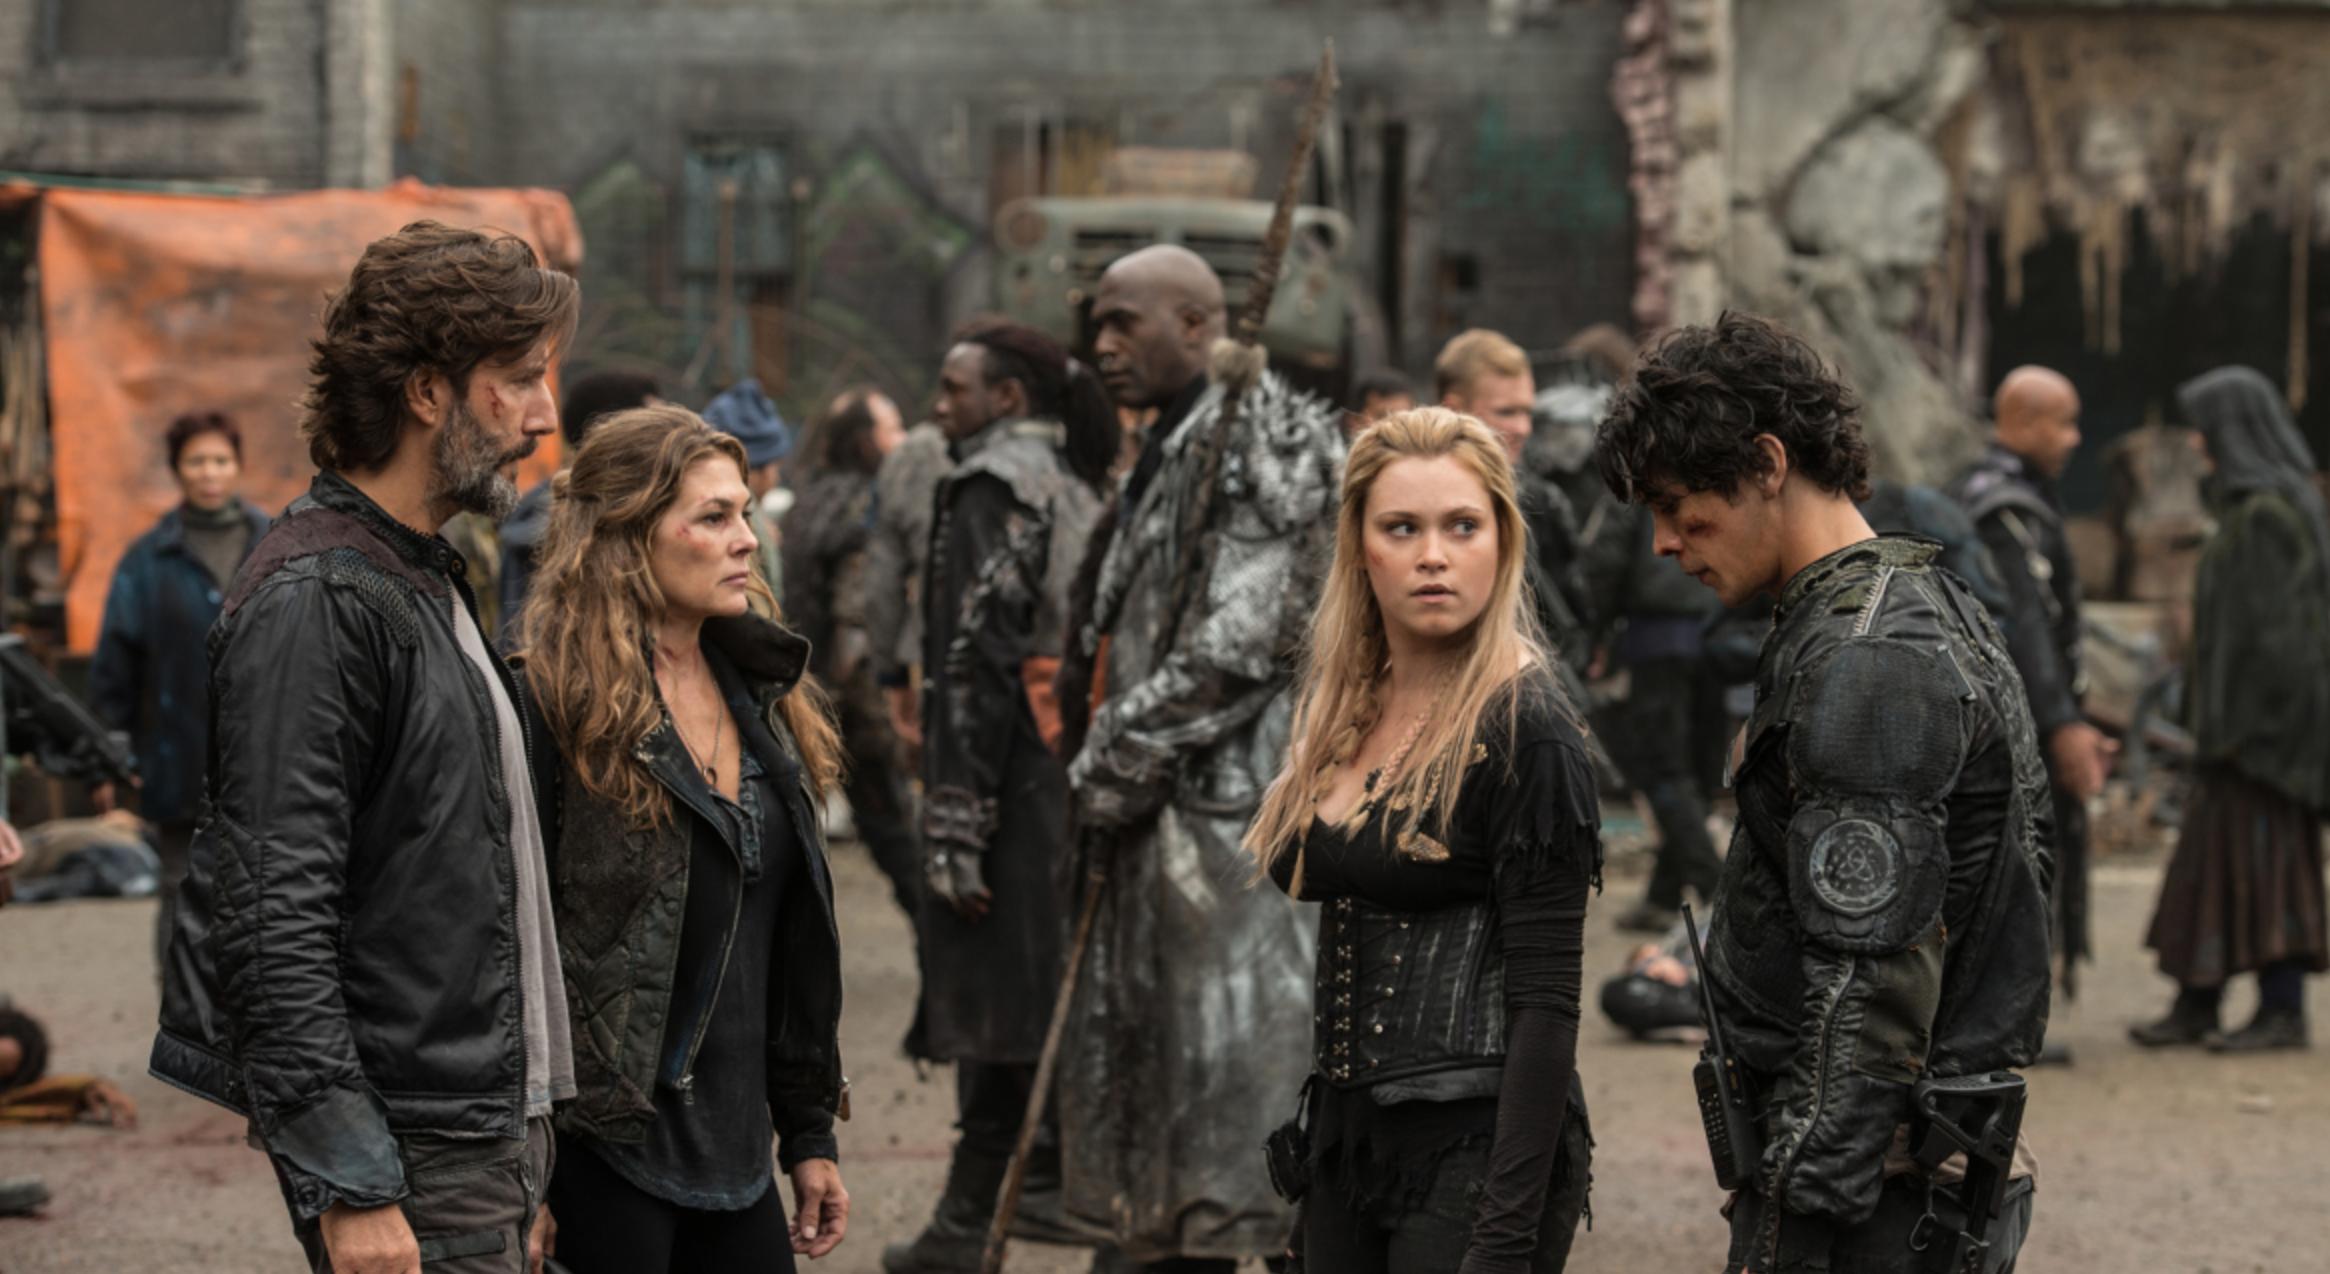 Bellarke with Abby and Kane -- newly awakened from the creepy City of Light, still in Polis where Season 3 left them.